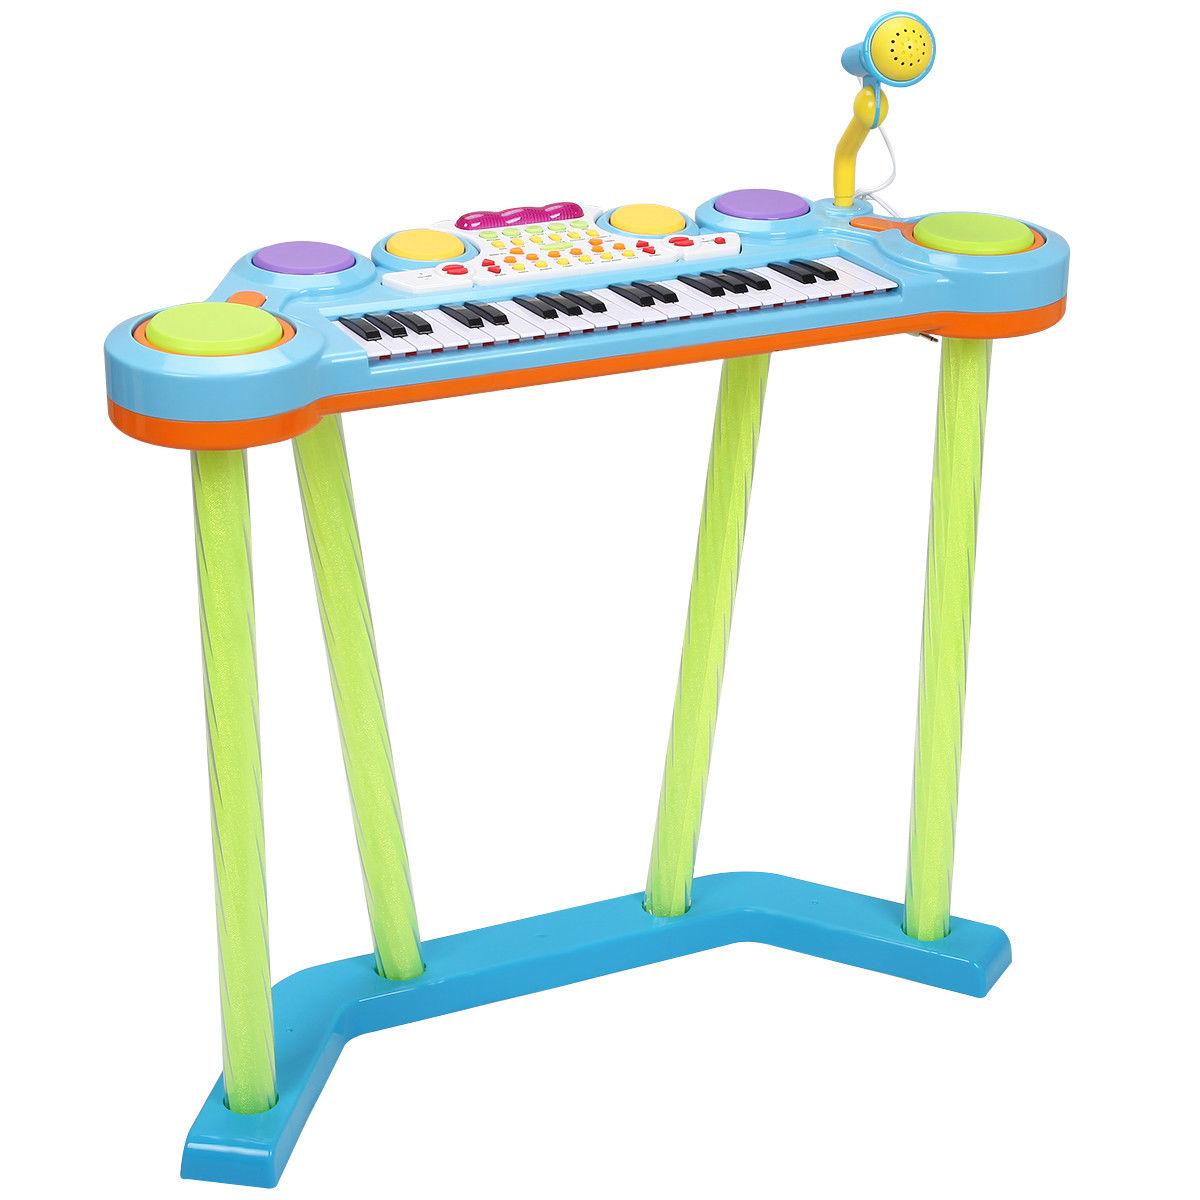 Kids 37 Key Electronic Keyboard Musical Piano w/ Microphone-Blue